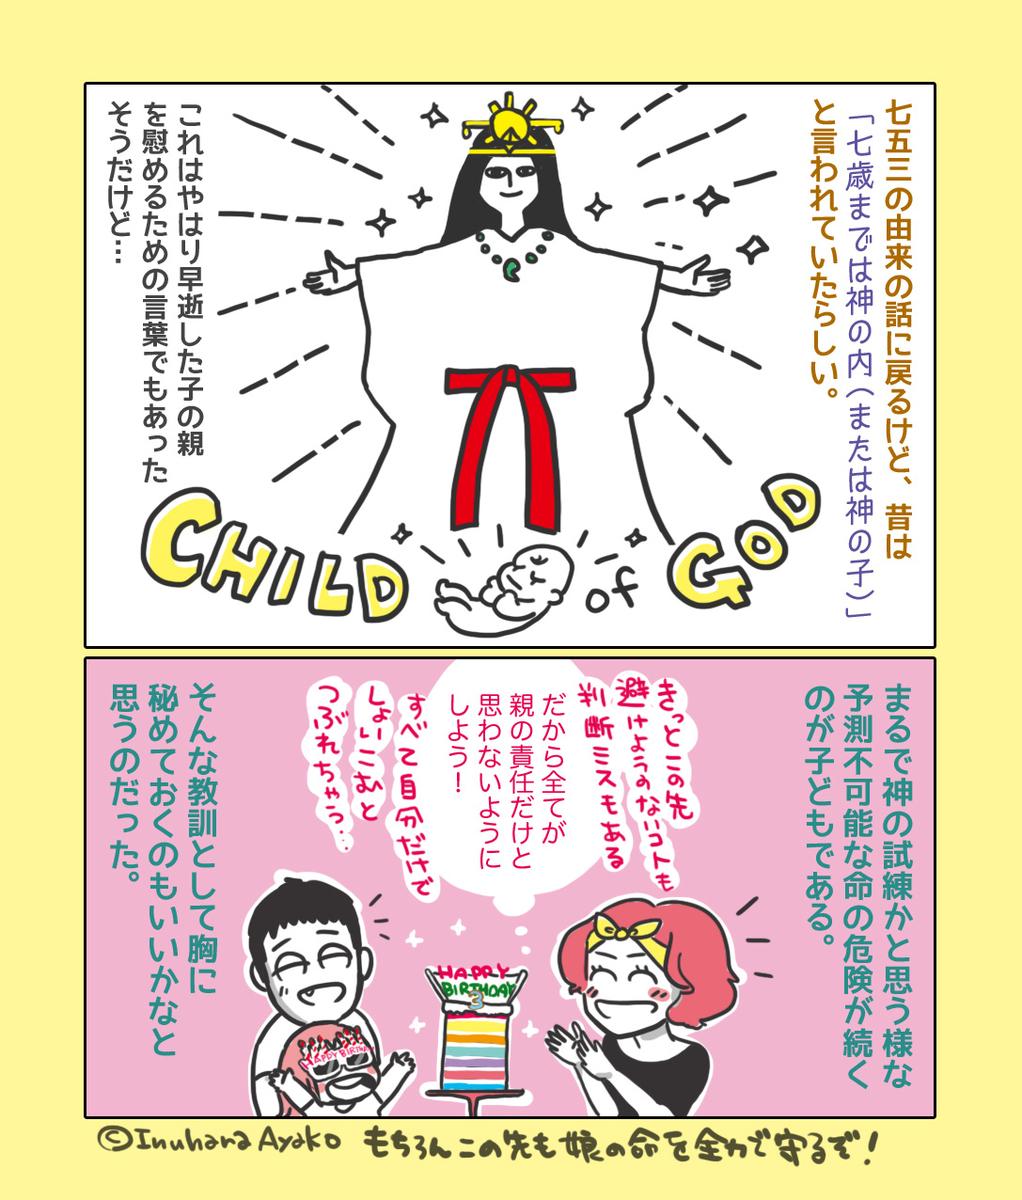 f:id:kaitousyoujyo_haha:20190708164427j:plain